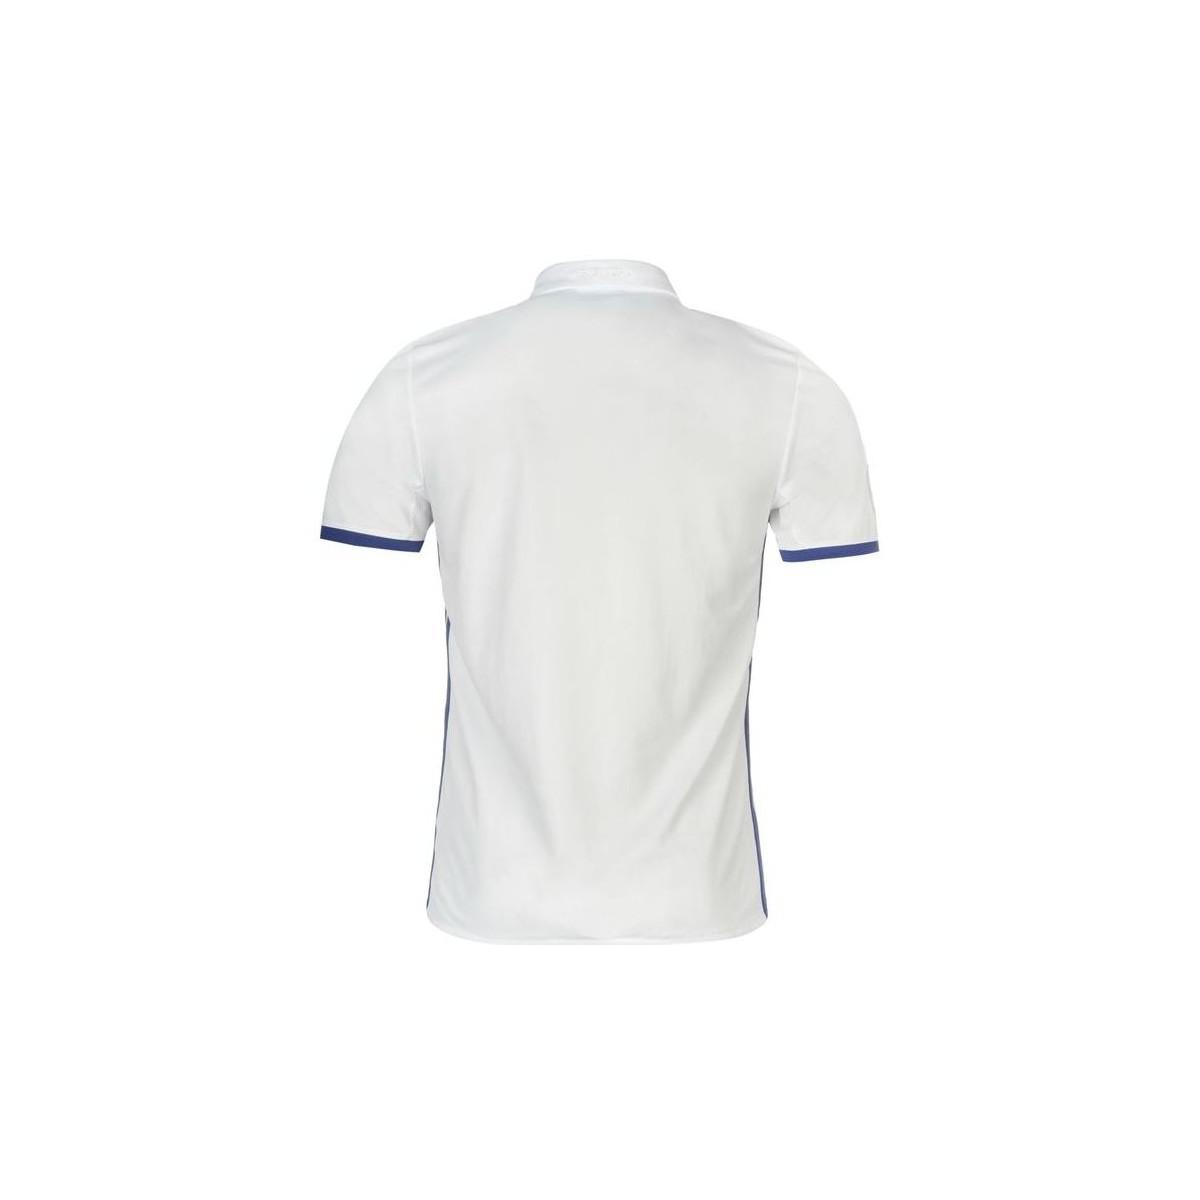 ca647c4d59a Adidas 2016-17 Real Madrid Home Shirt (modric 19) Men s T Shirt In ...